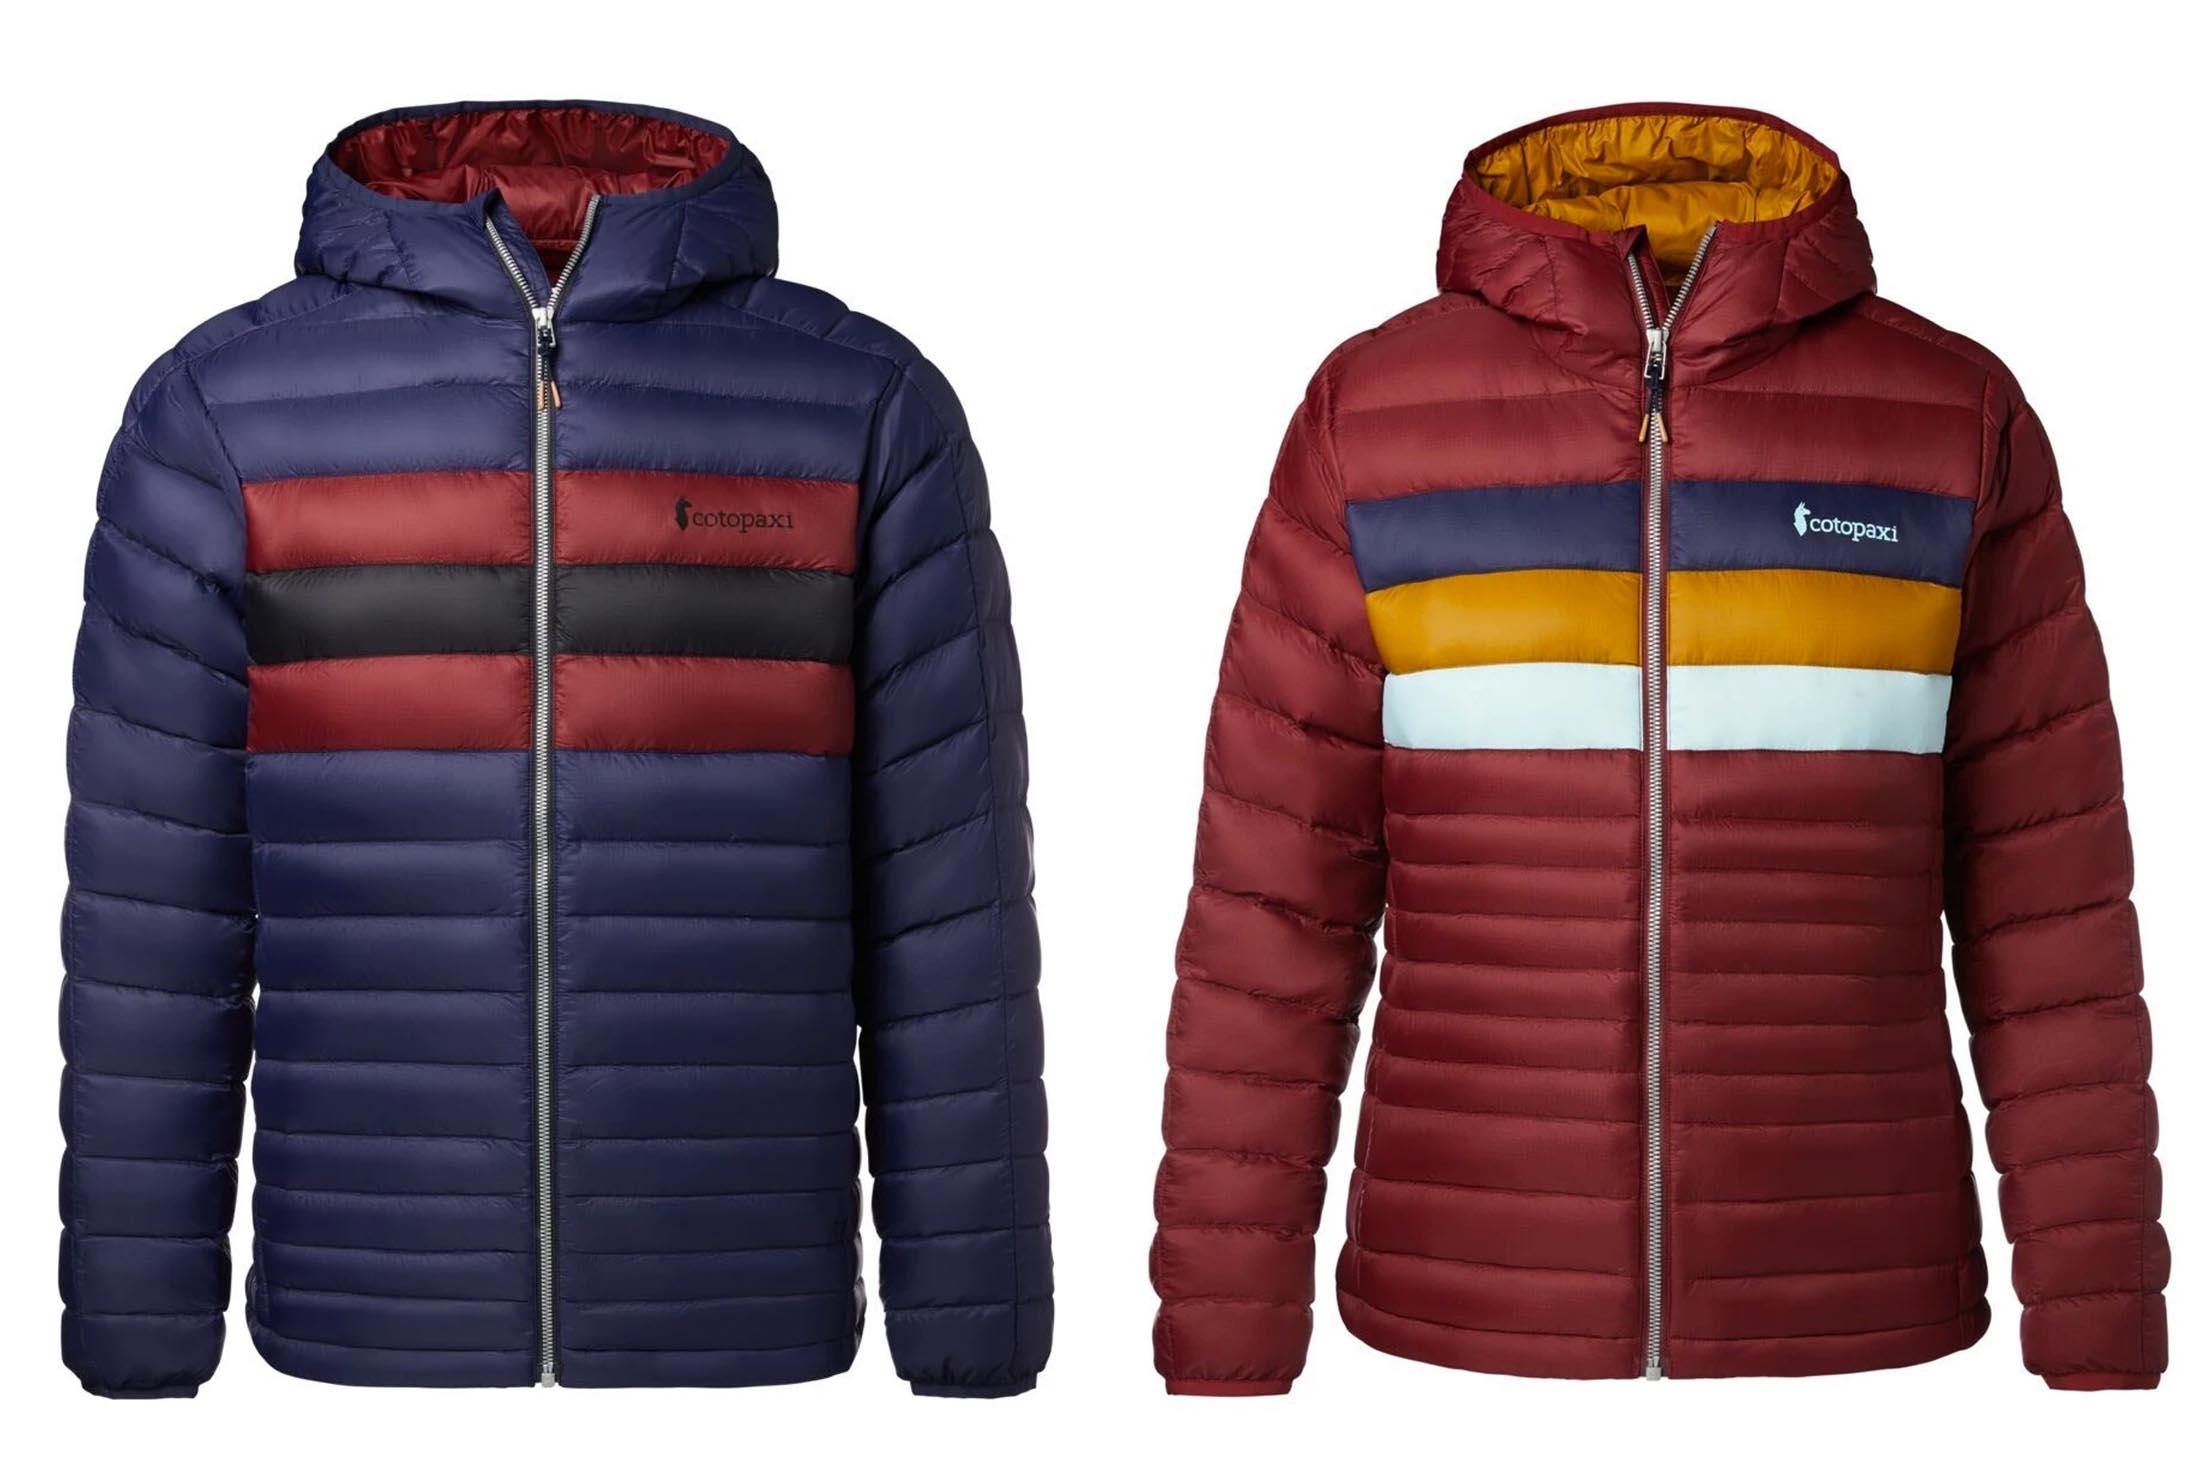 cotopaxi jacket